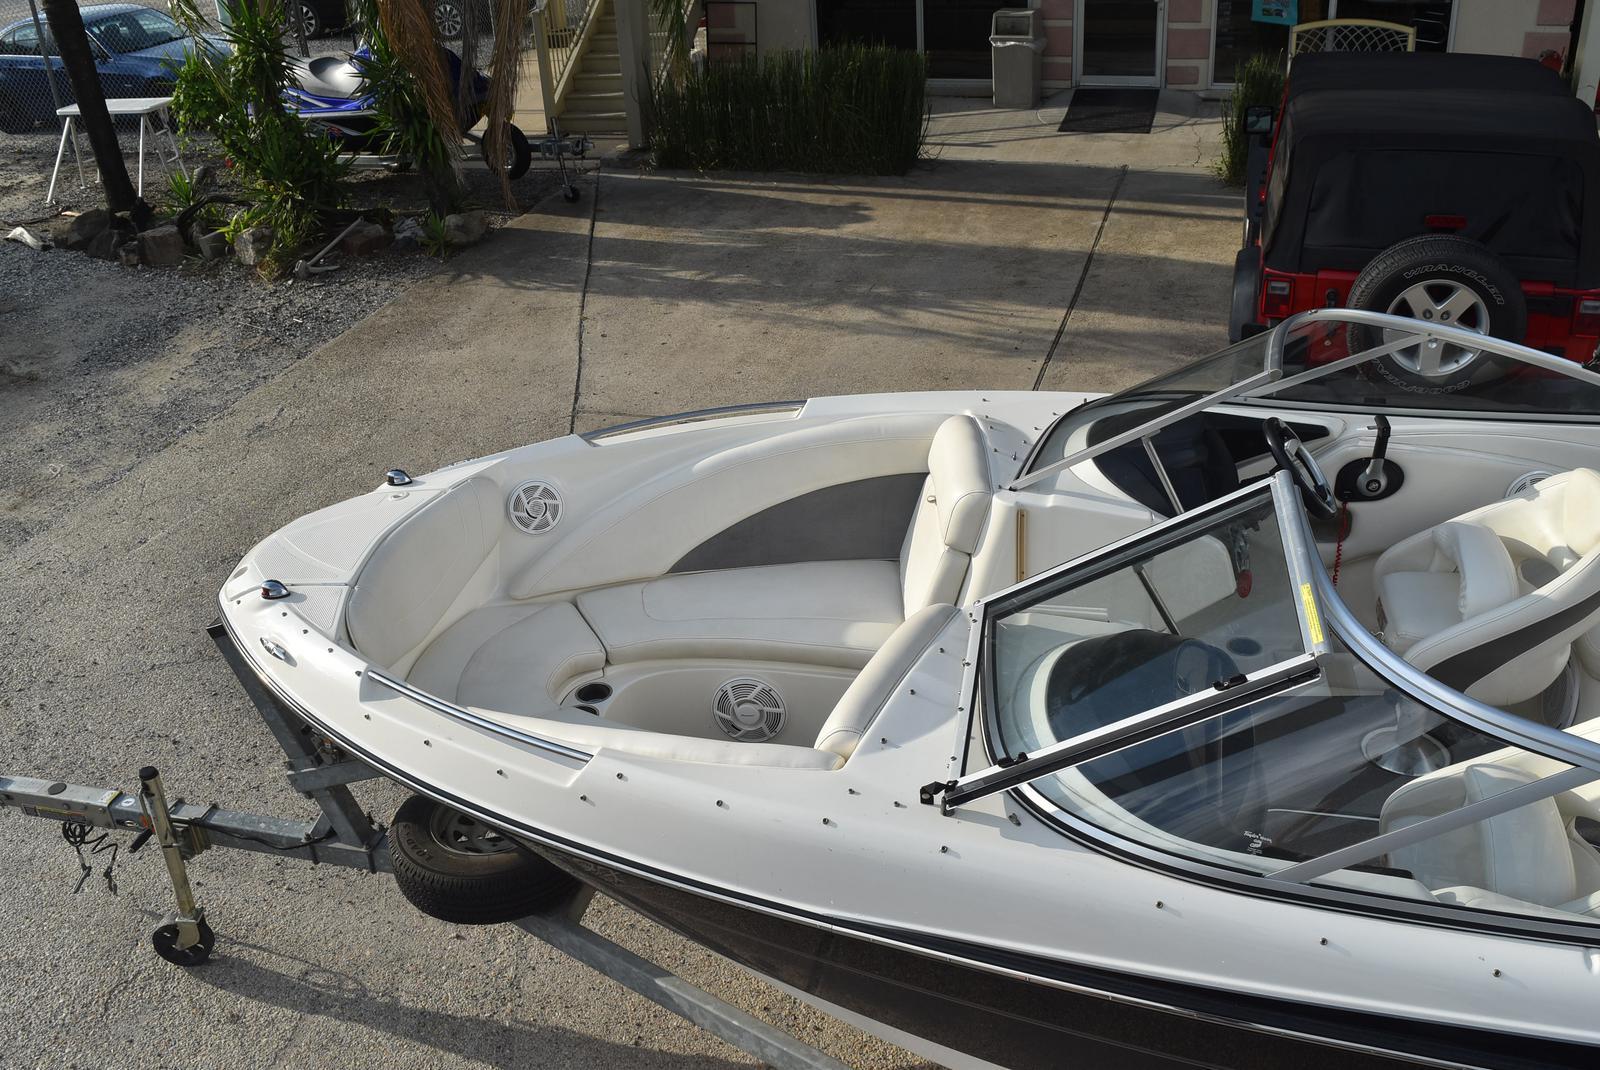 2010 Bayliner boat for sale, model of the boat is 235BR & Image # 12 of 43